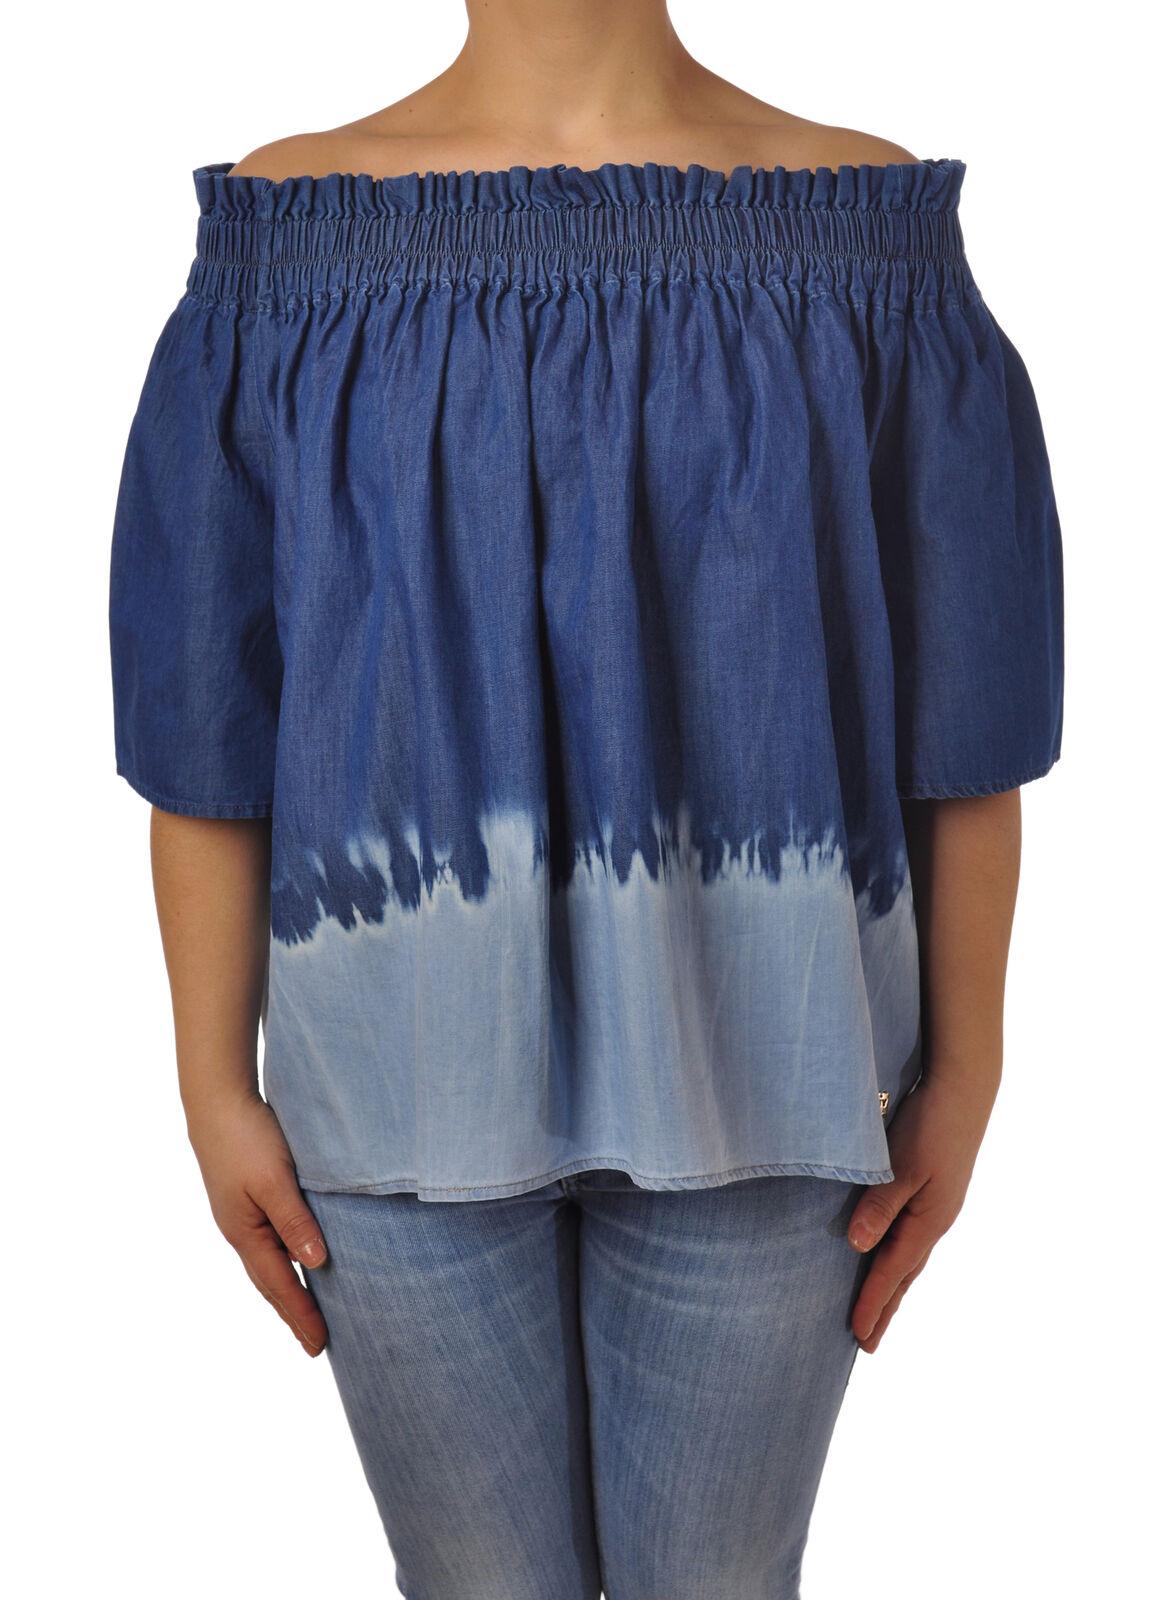 Twin Set - Shirts-Shirt - Woman - Denim - 5096410H185936